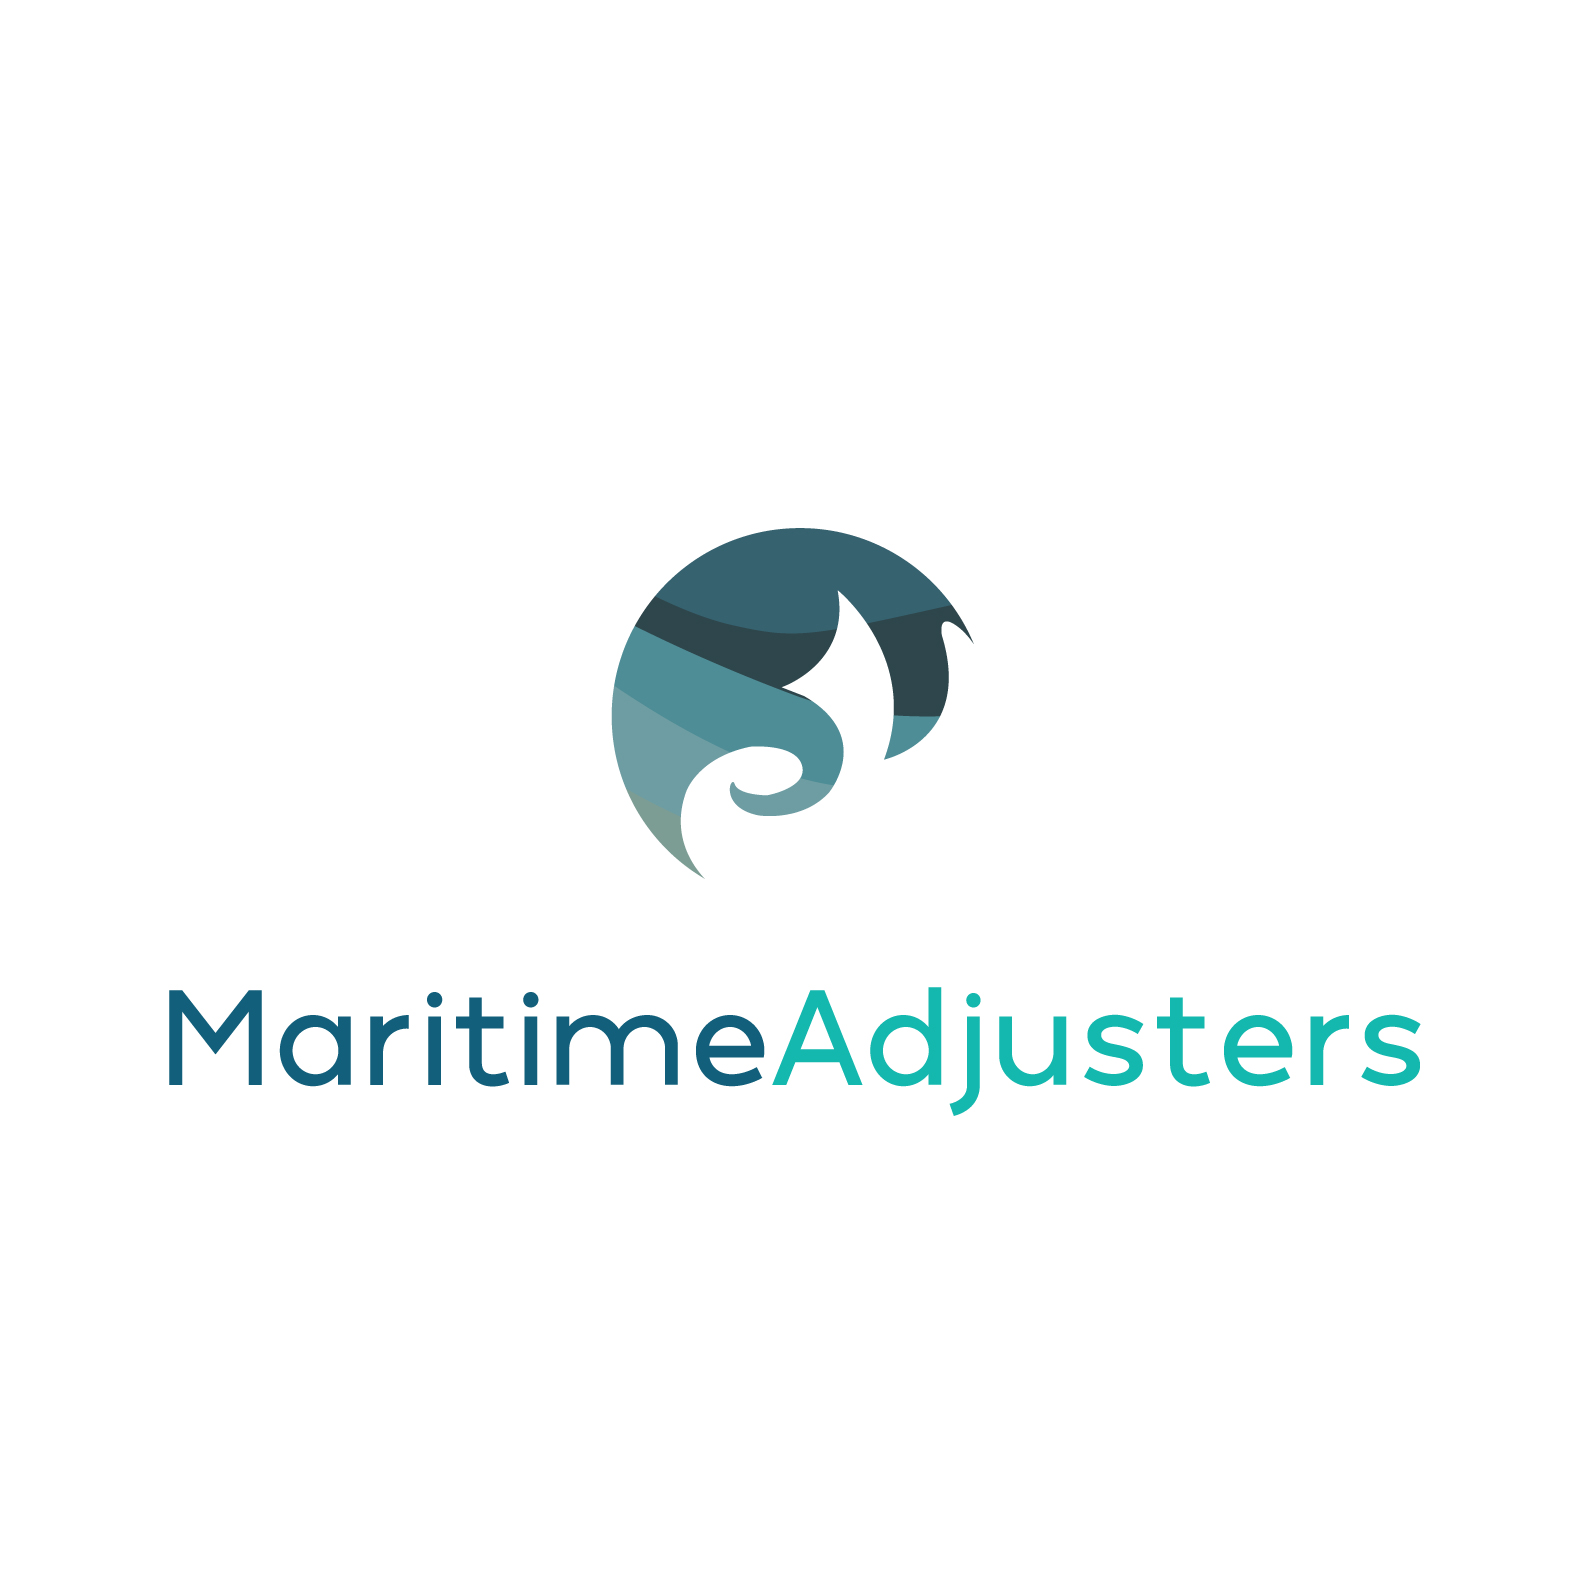 Maritime_Adjusters_wave